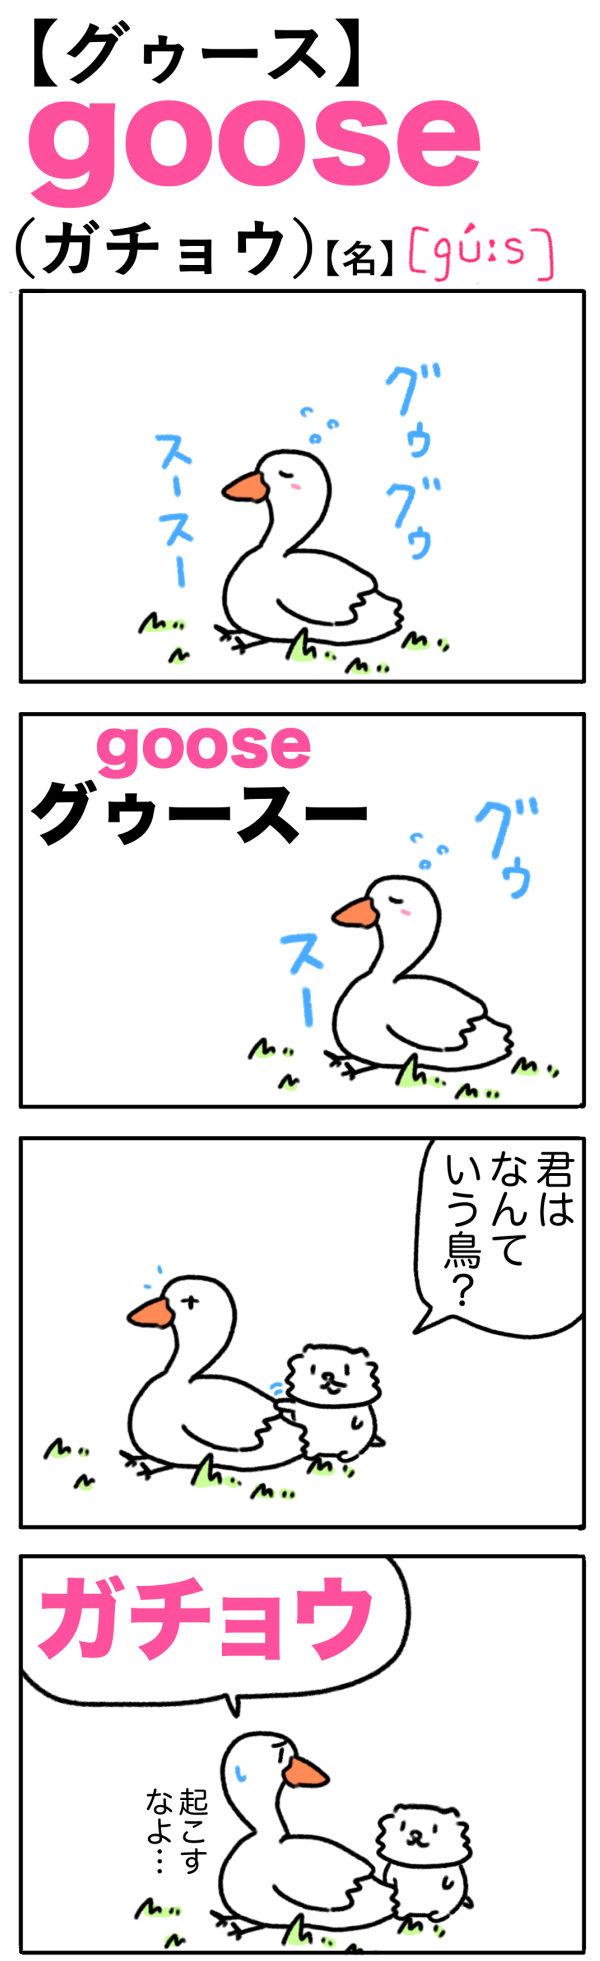 goose(ガチョウ)の語呂合わせ英単語